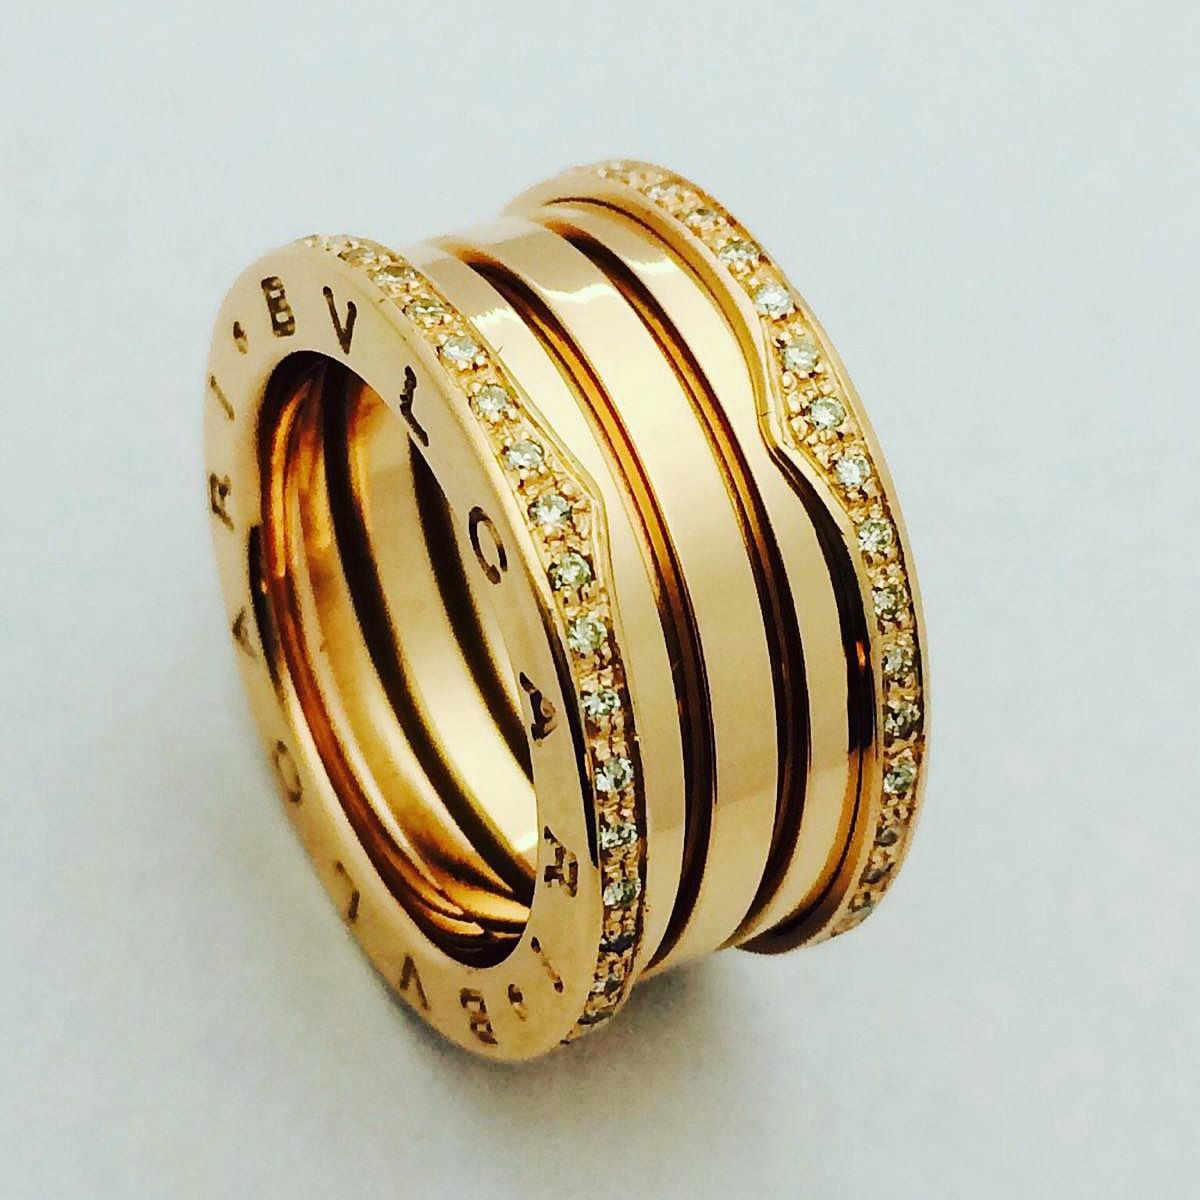 f9a2ea52717 par aliança   anel bvlgari b-zero ouro 18k brilhantes. Carregando zoom.